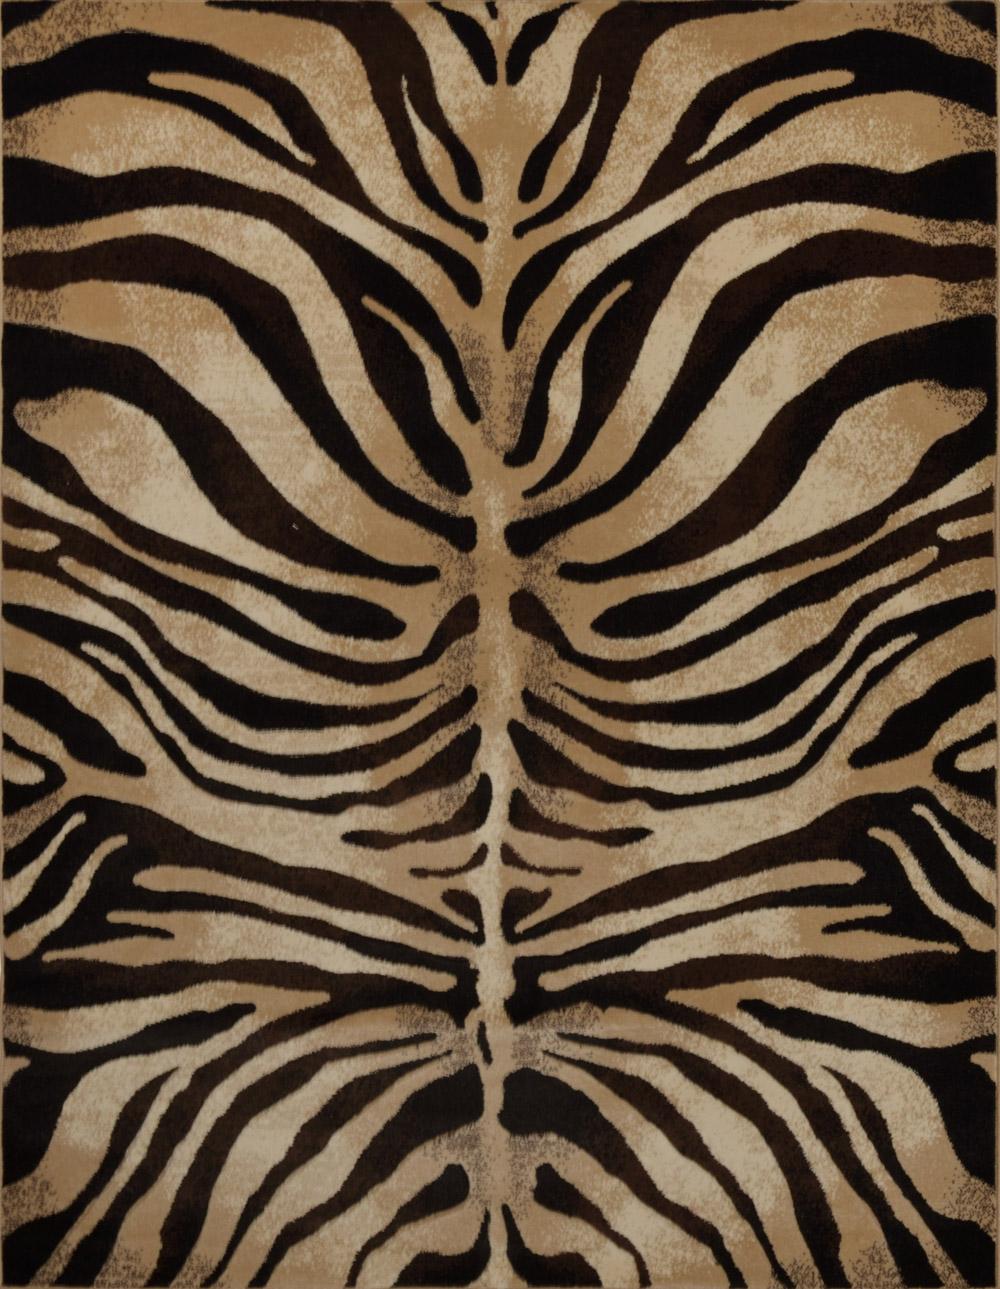 Modern Zebra Stripes Area Rug 3x5 Animal Skin Print Carpet